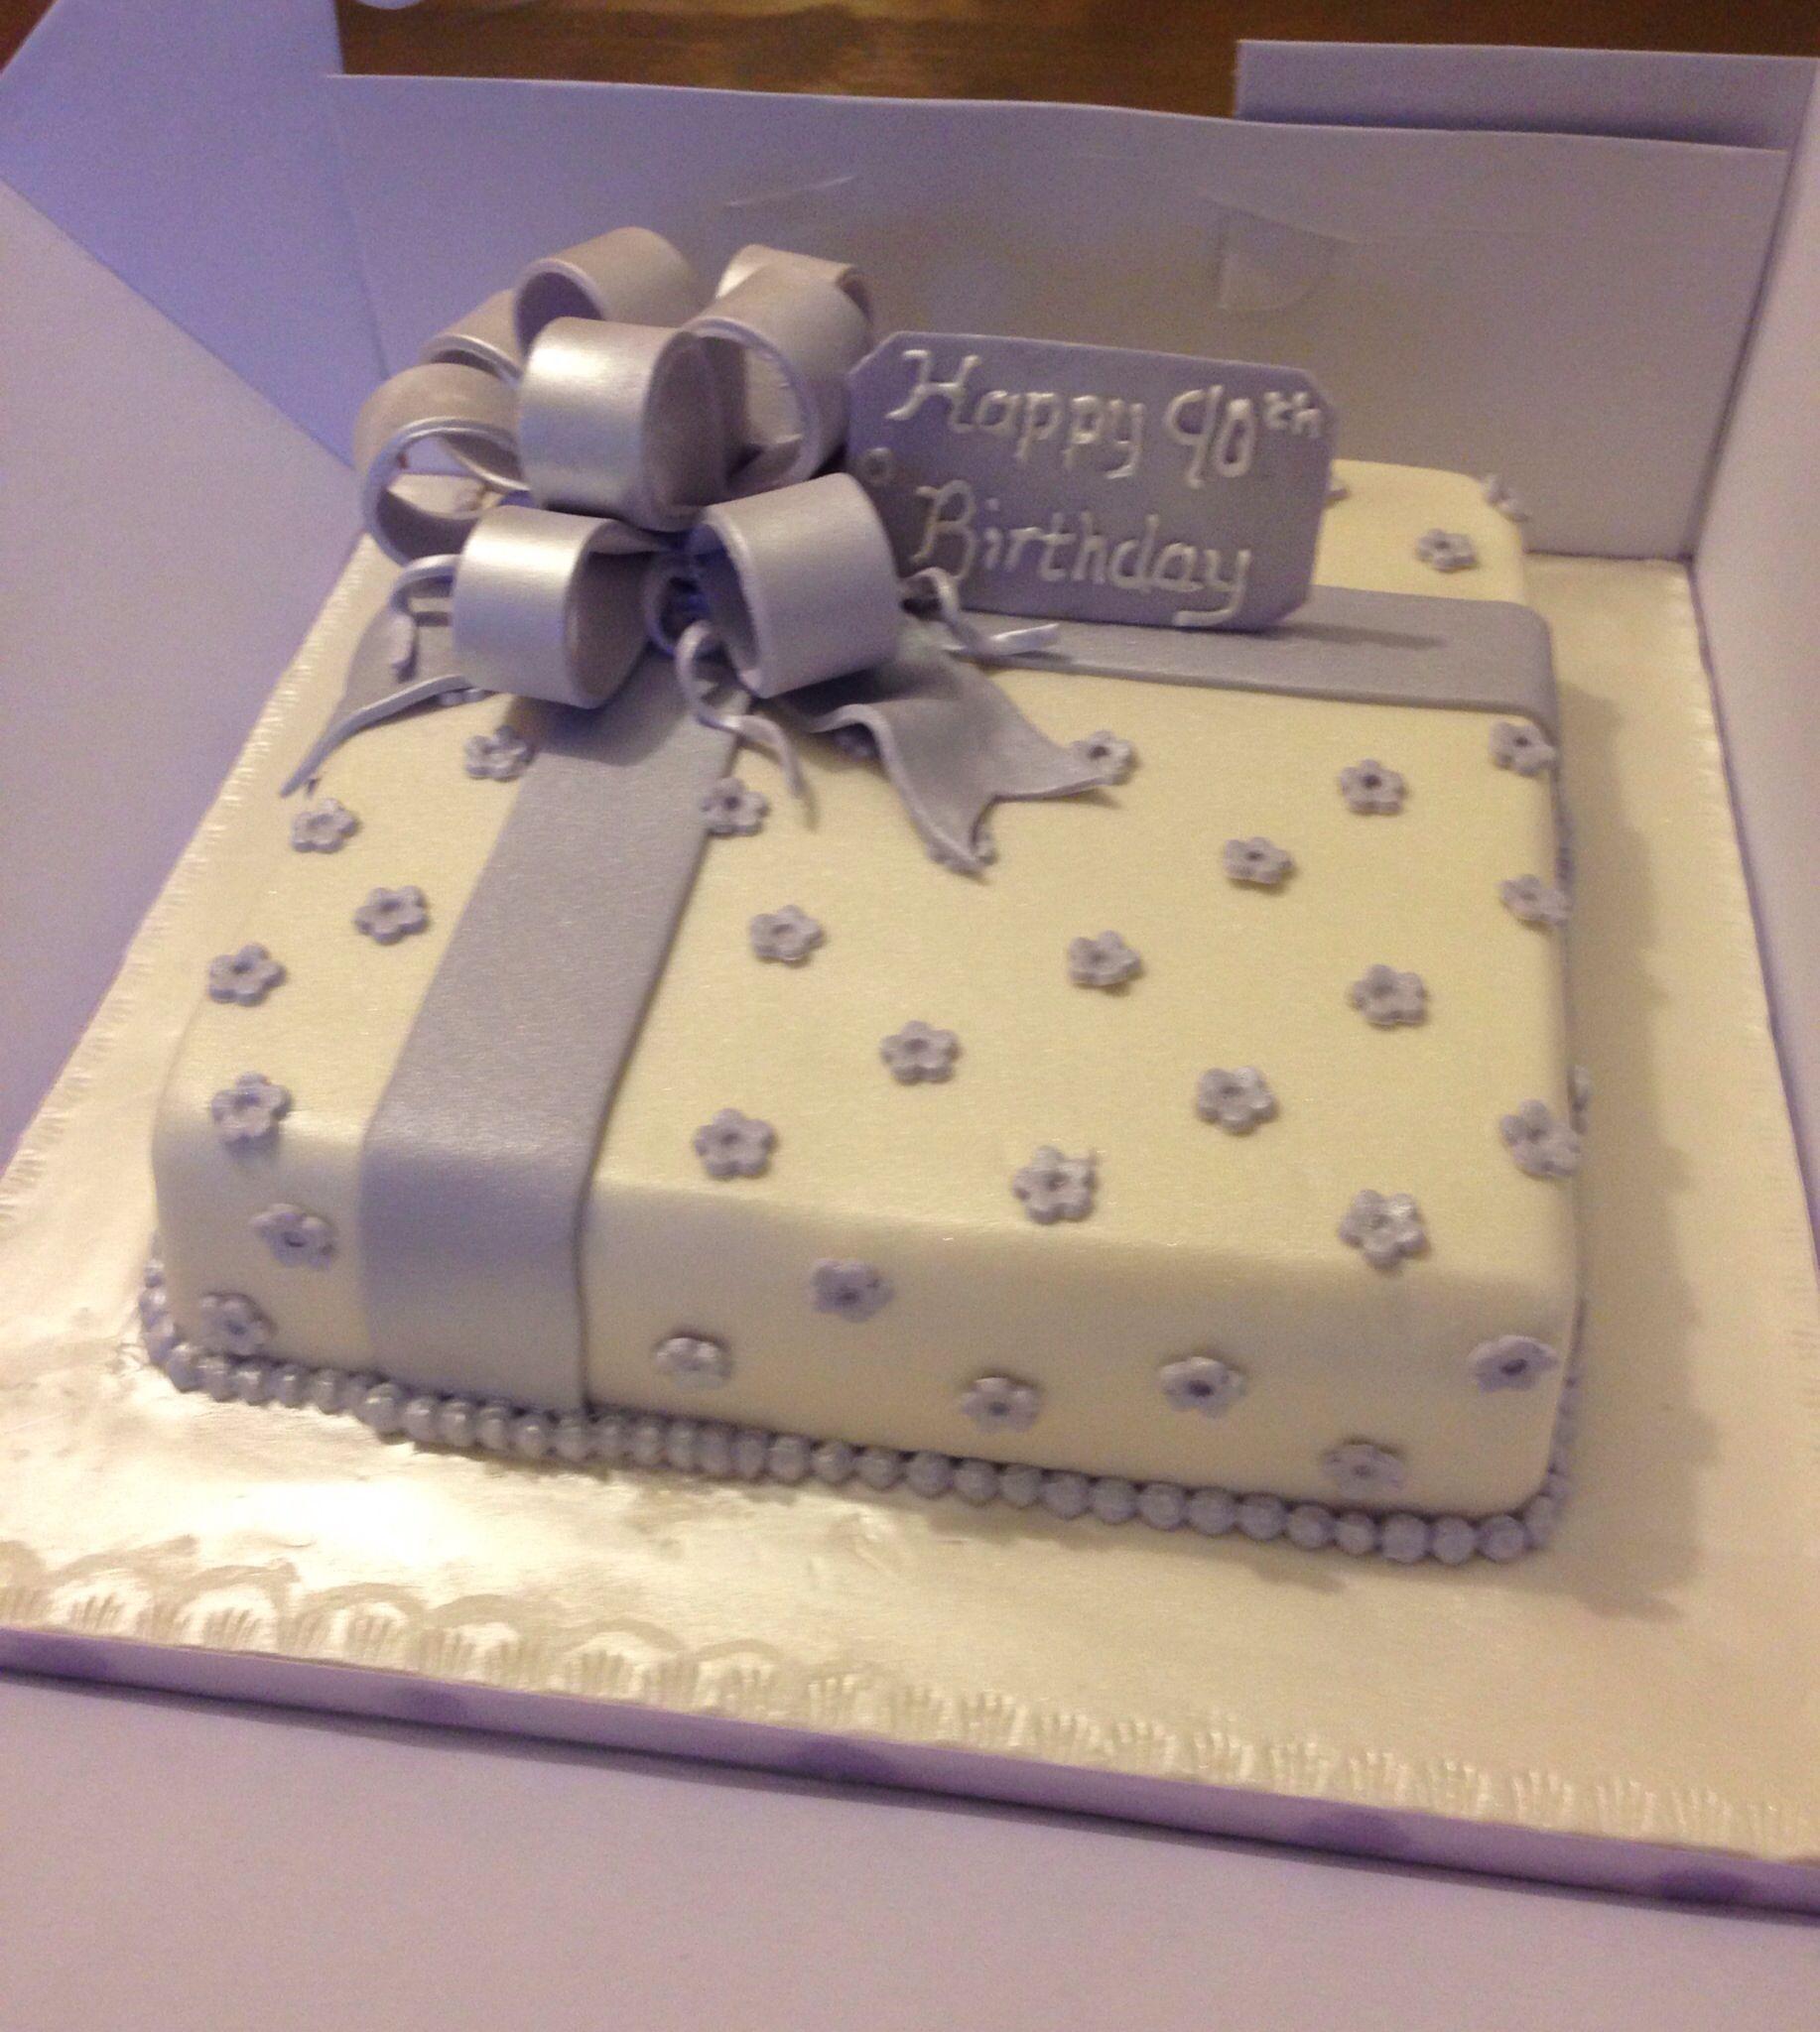 Astounding Birthday Present Cake With Images Birthday Sheet Cakes Funny Birthday Cards Online Drosicarndamsfinfo